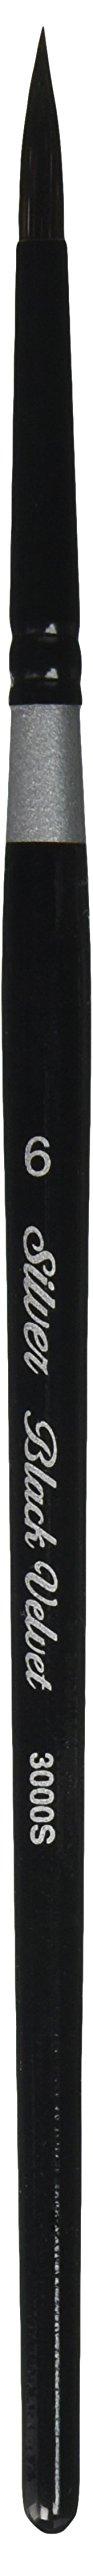 Silver Brush 3000S-6 Black Velvet Short Handle Blend Squirrel and Risslon Brush, Round, Size 6